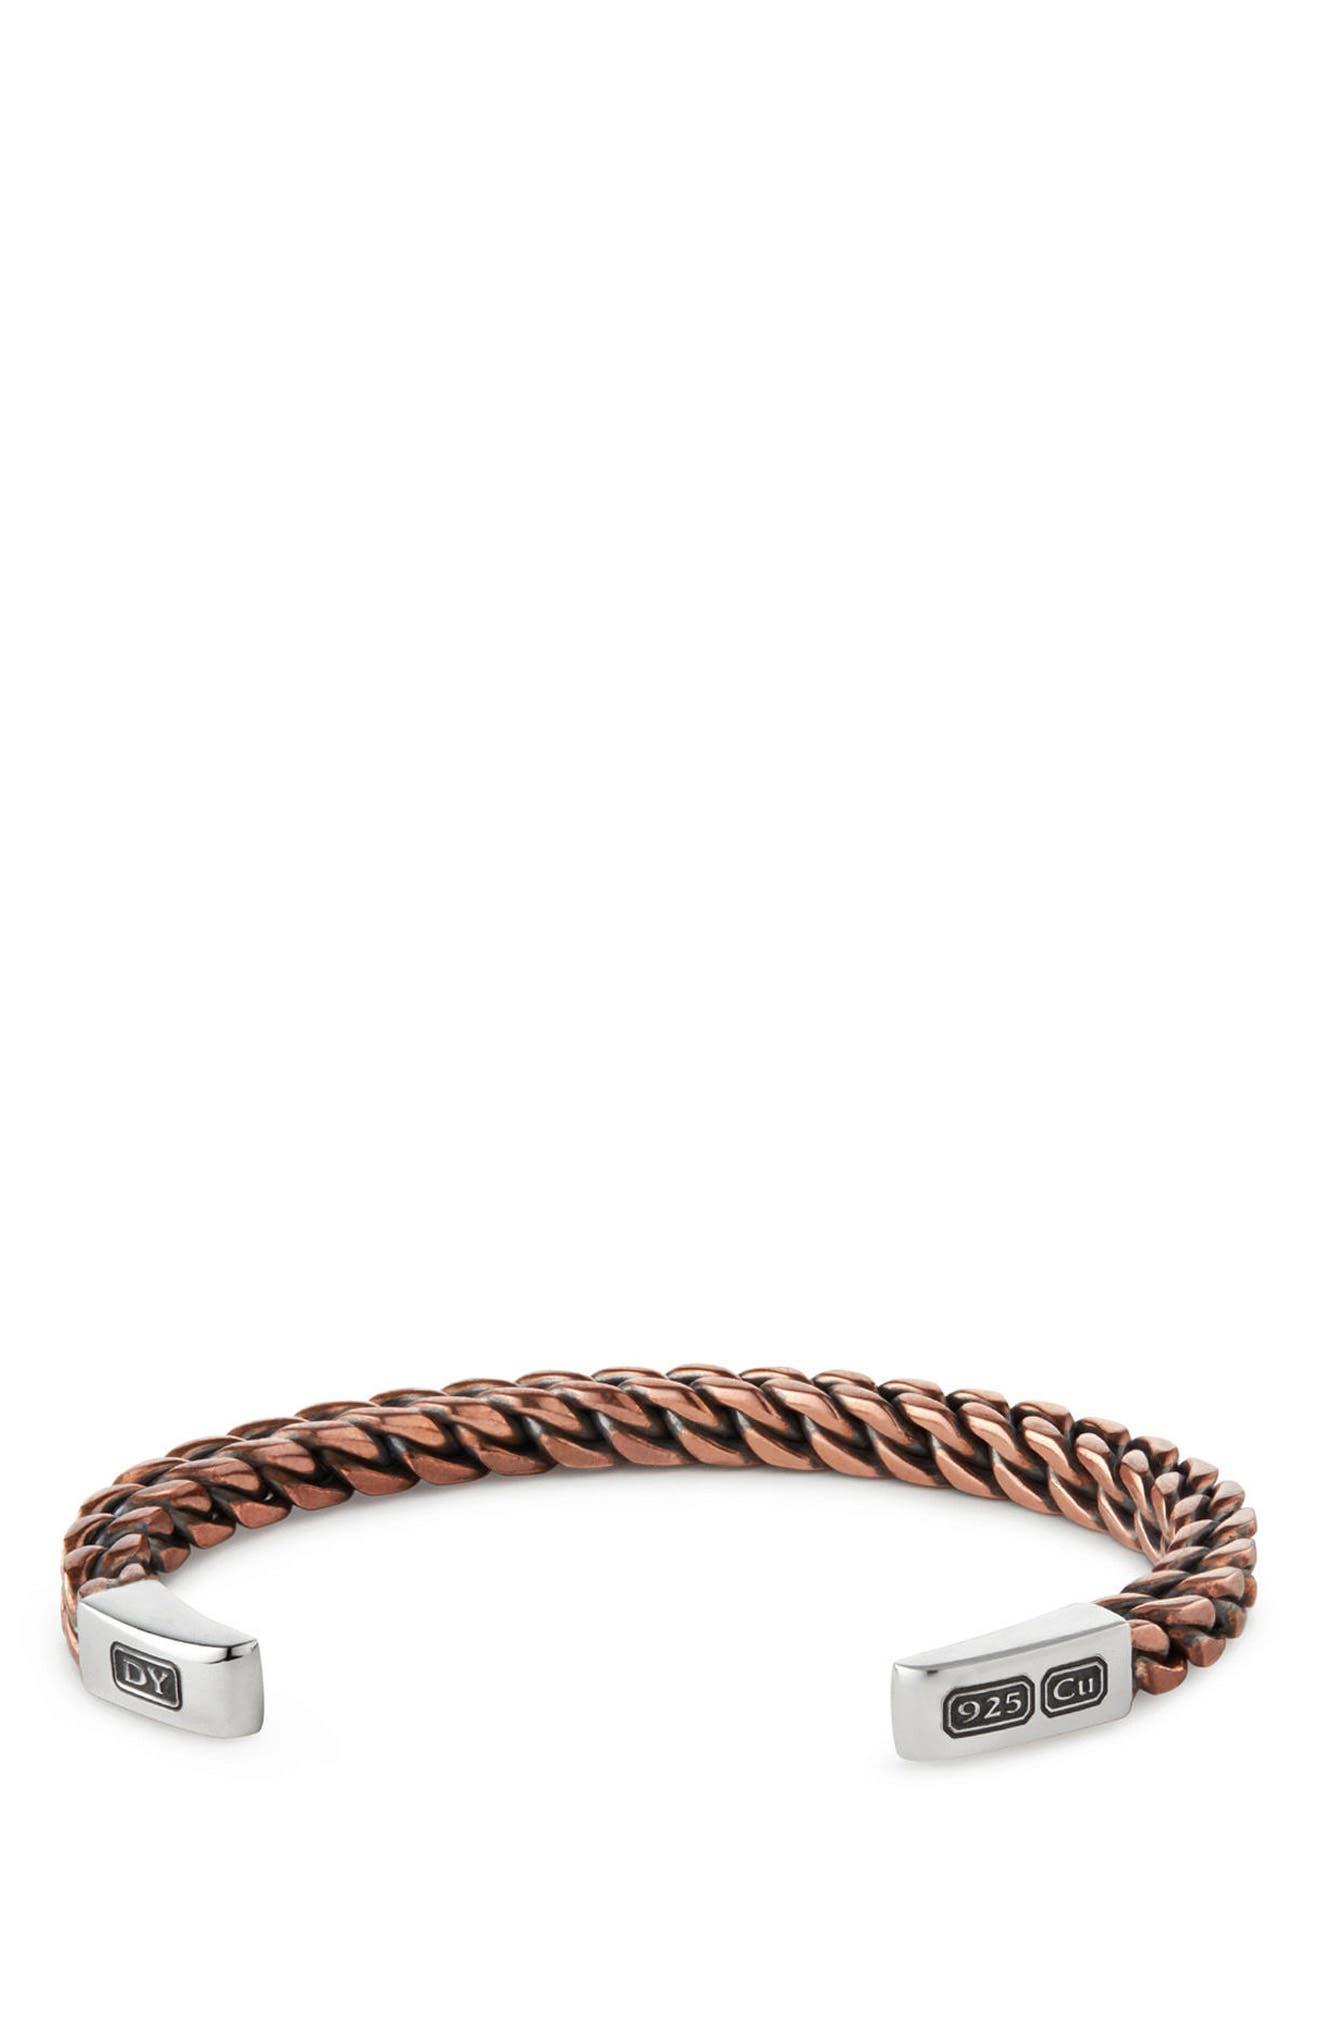 Woven Cuff Bracelet,                             Main thumbnail 1, color,                             Silver/ Copper